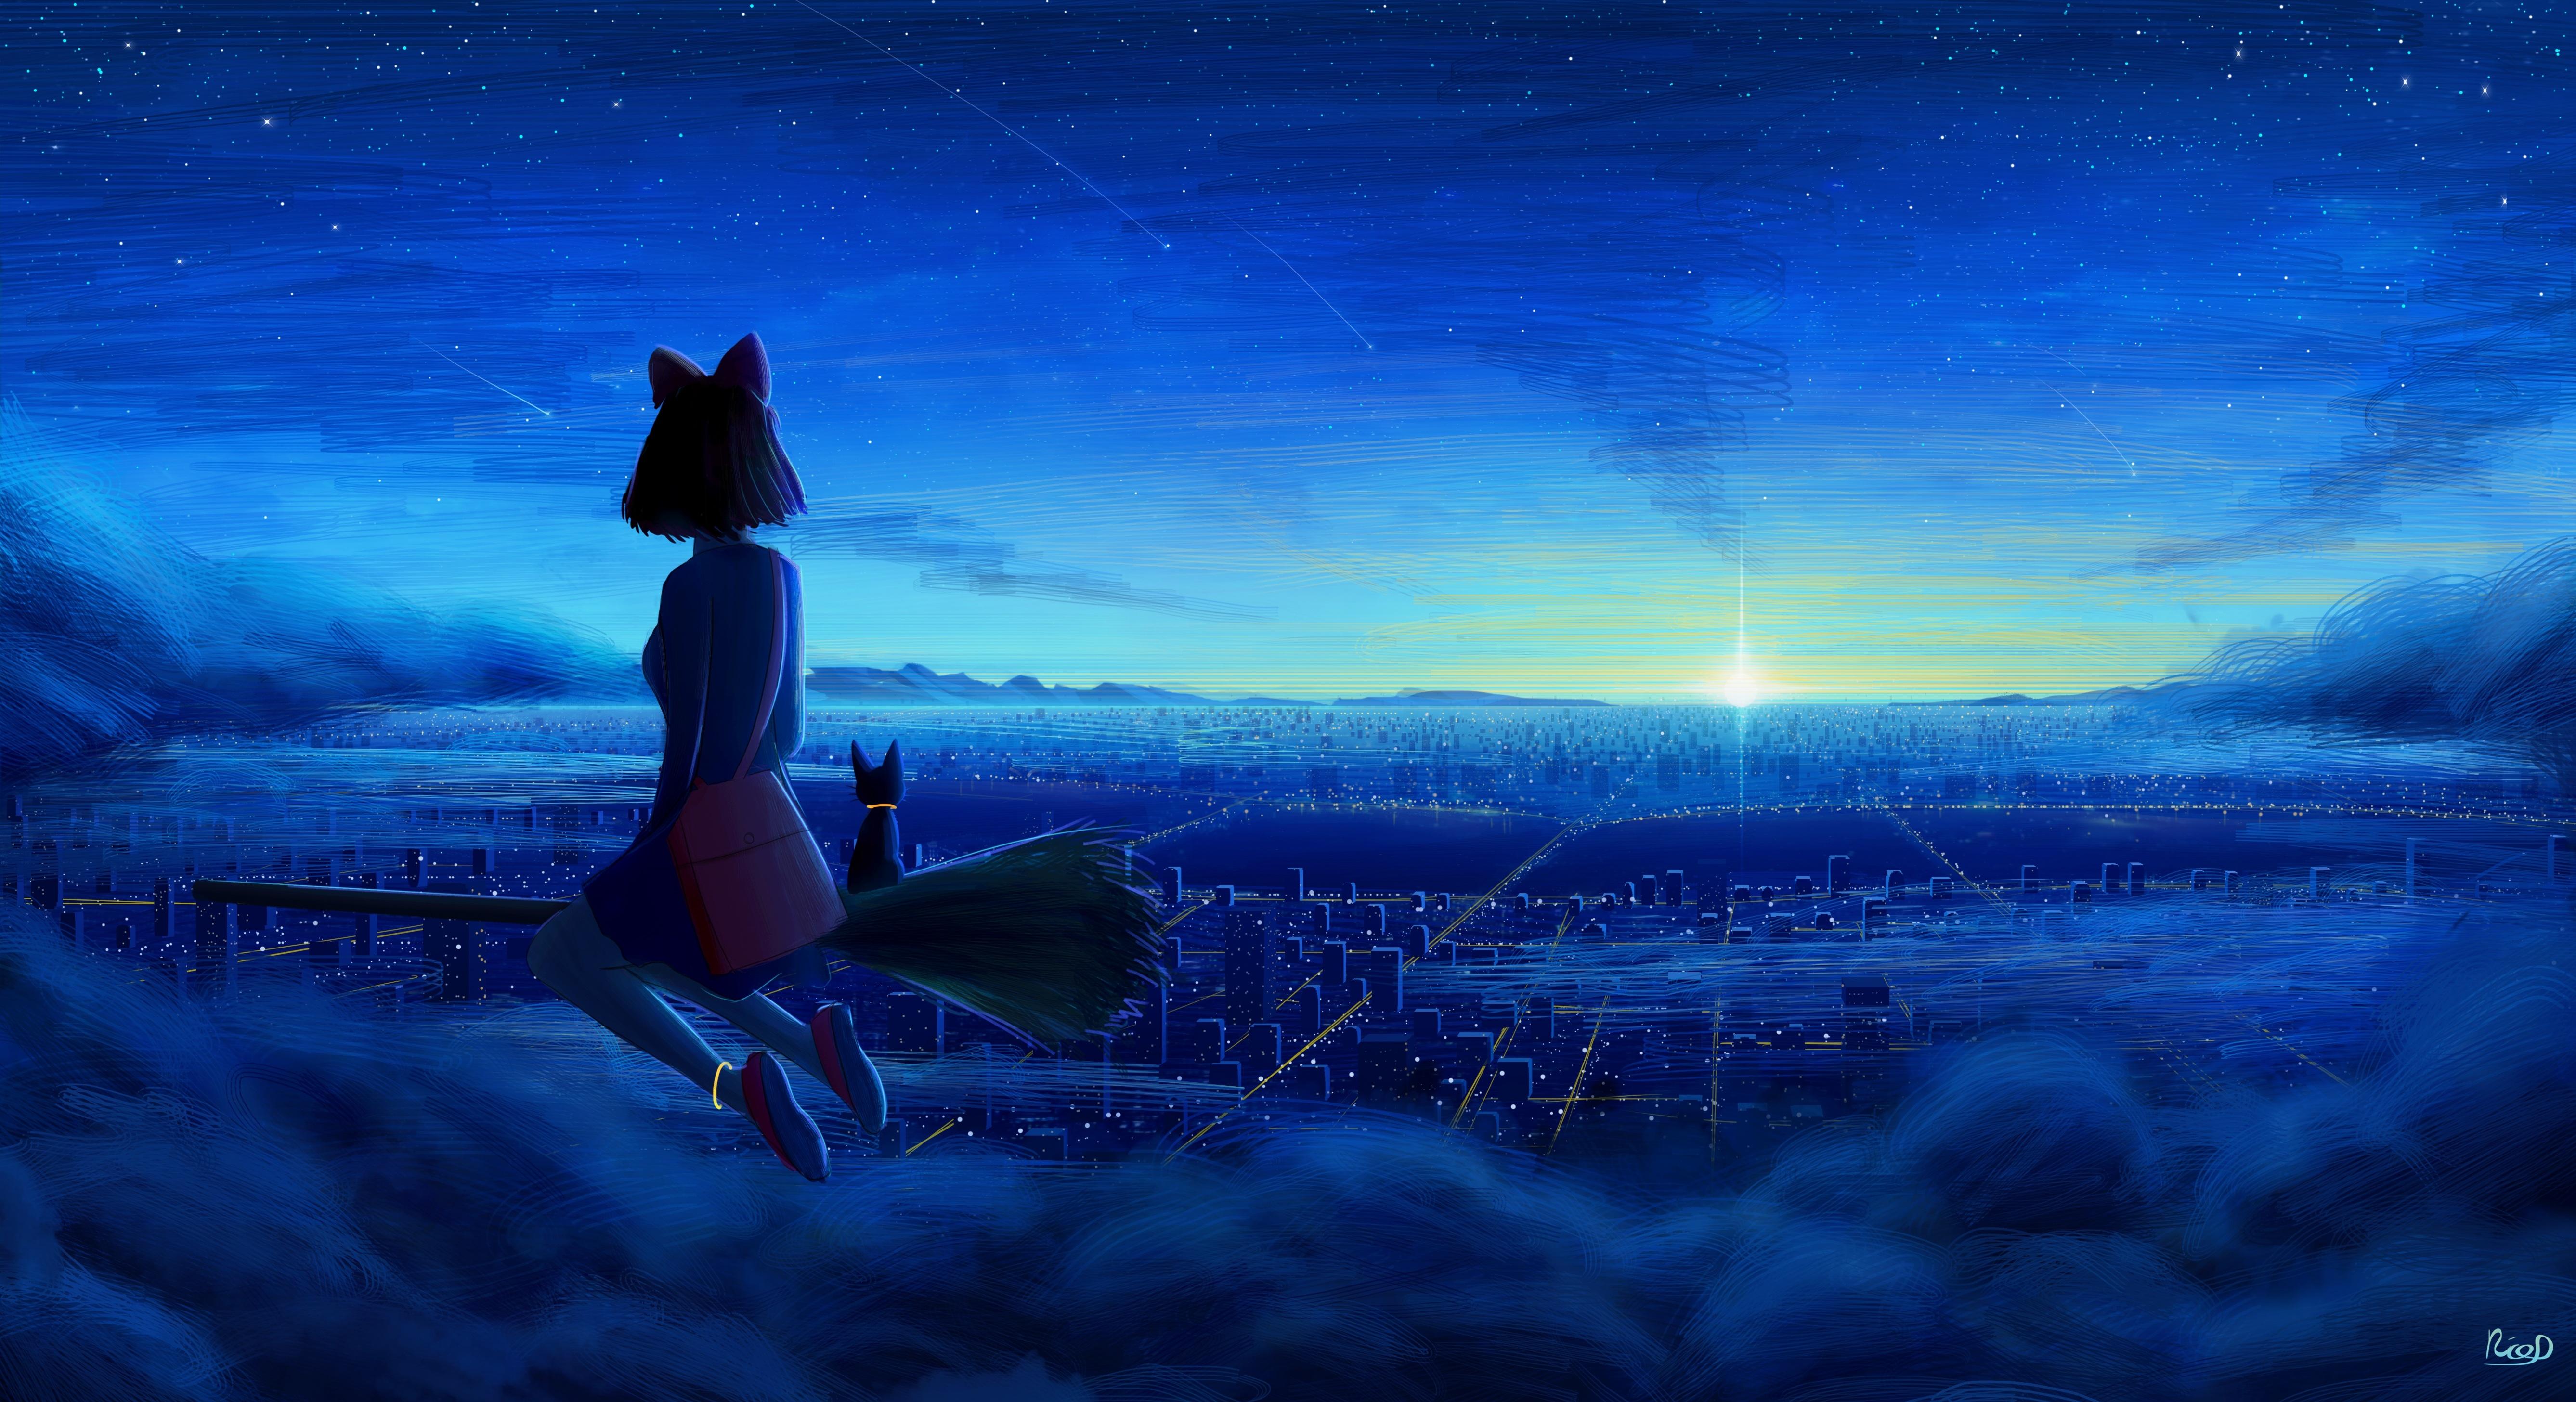 Kiki And Jiji In Kikis Delivery Service Wallpaper Hd Anime 4k